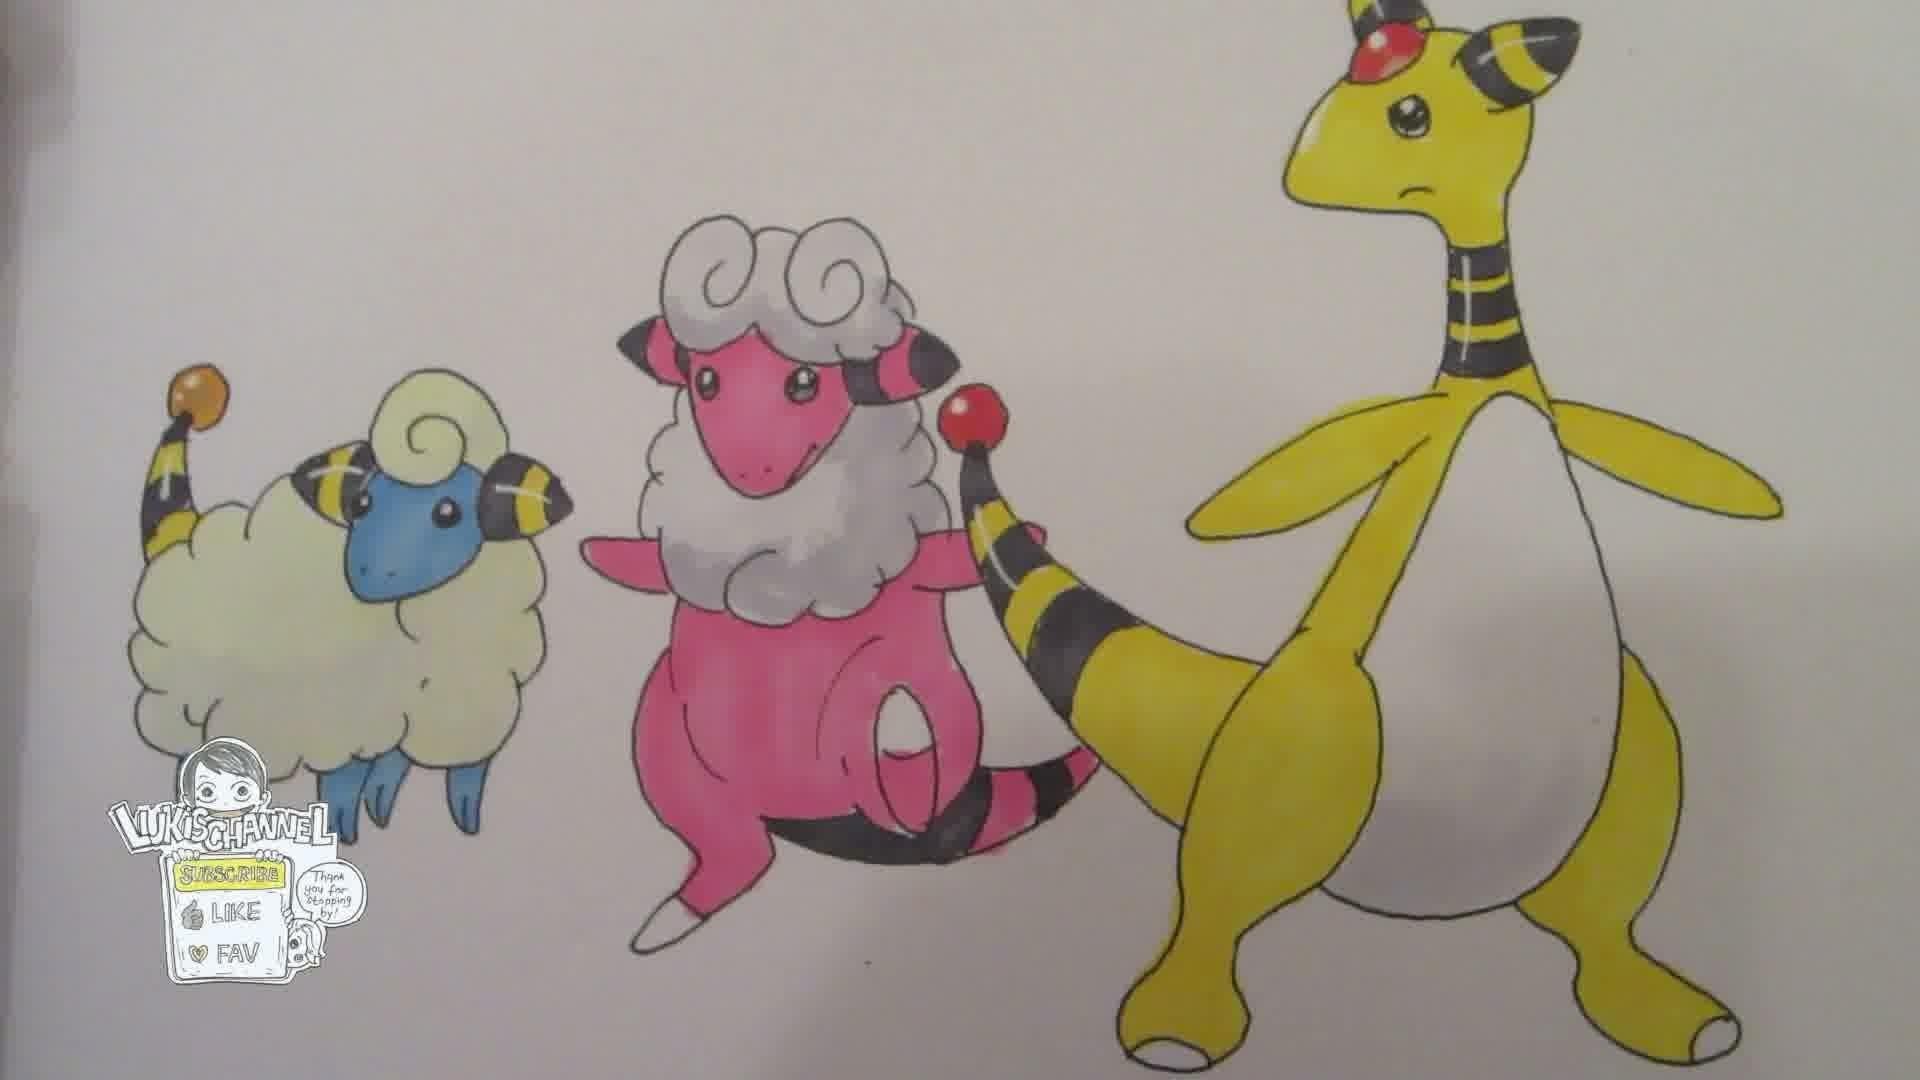 How to draw Pokemon: No.179 Mareep, No.180 Flaaffy, No.181 Ampharos